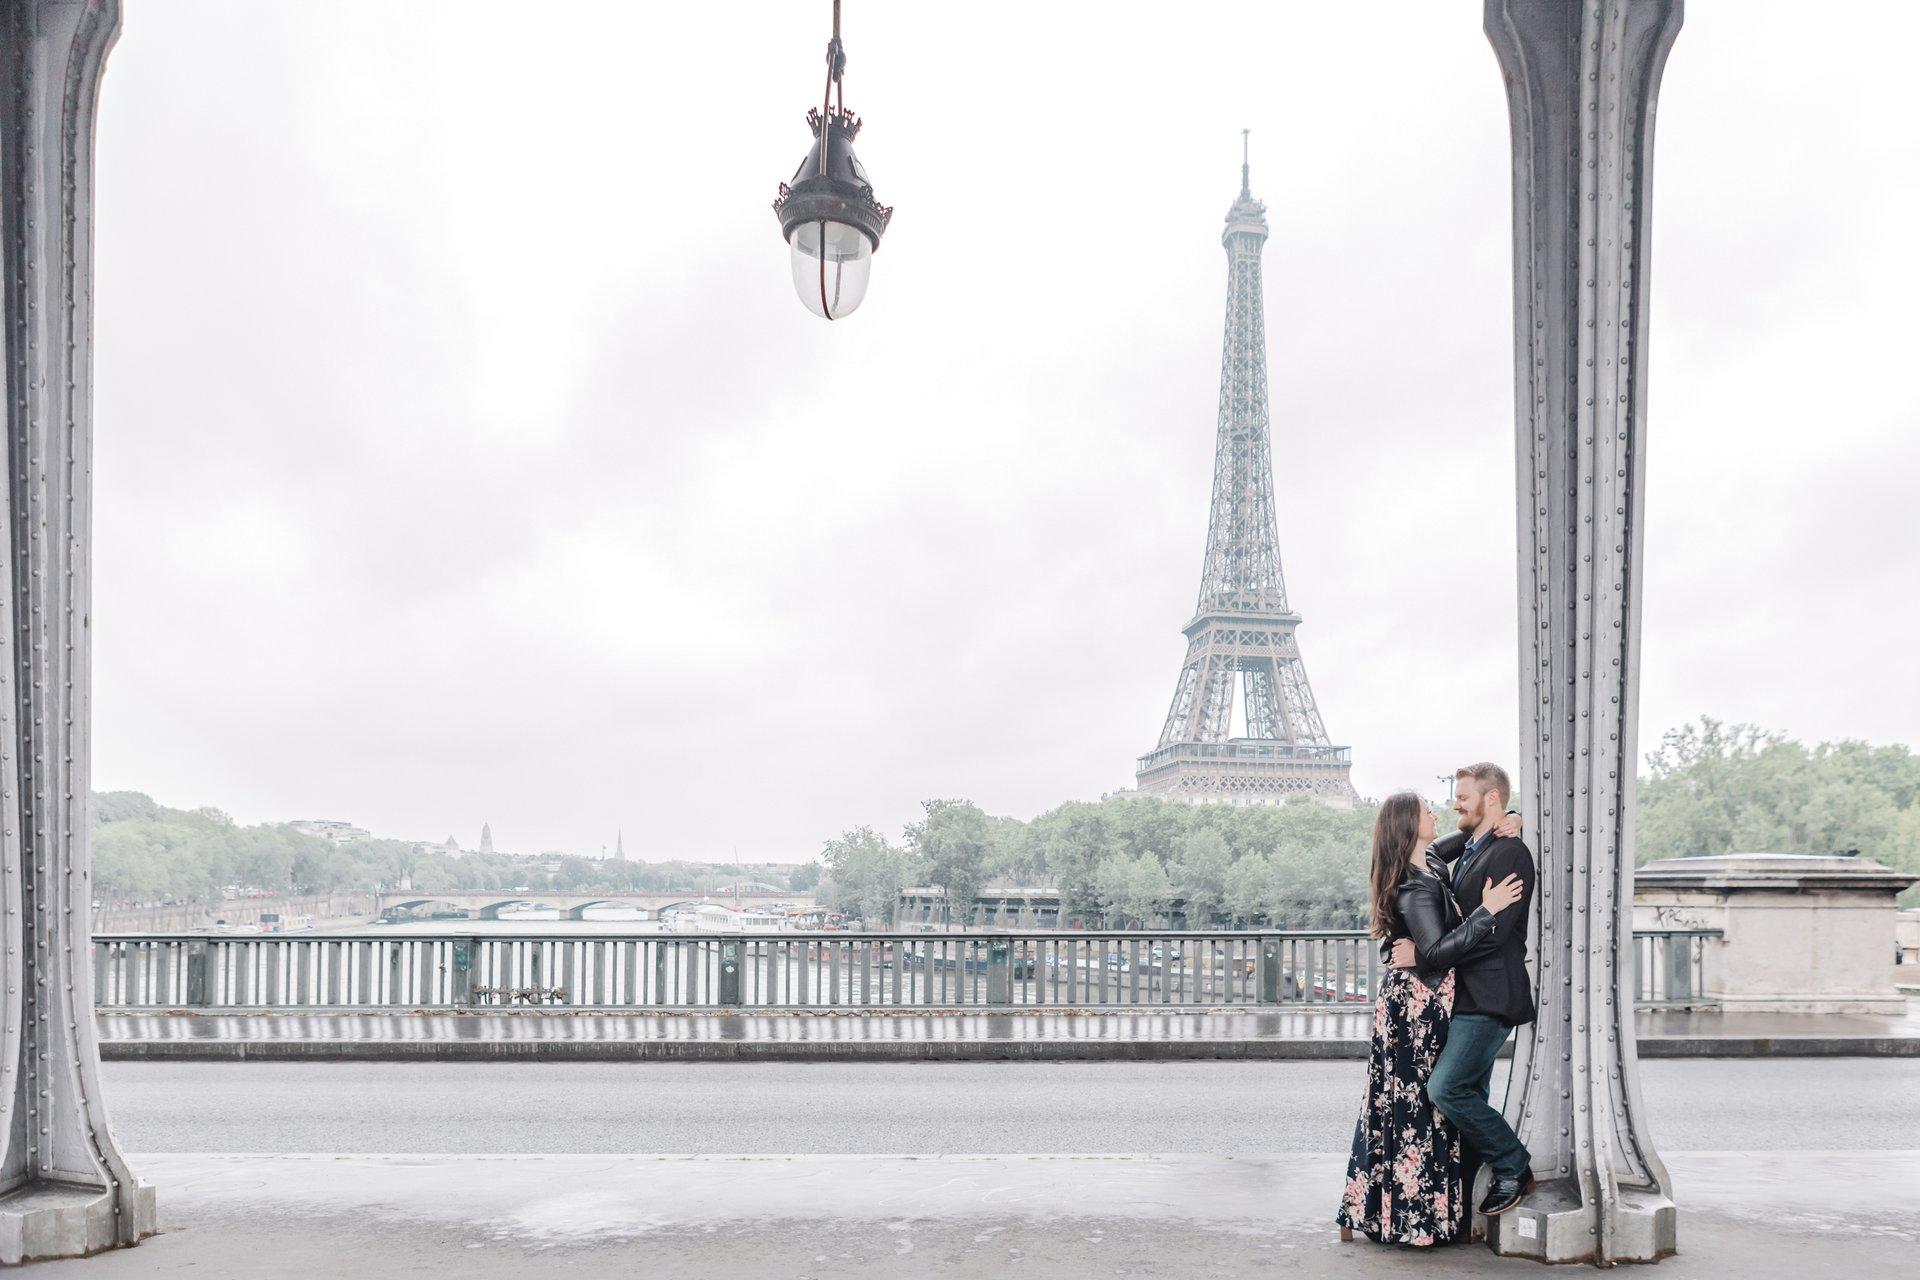 Paris-France-travel-story-Flytographer-43